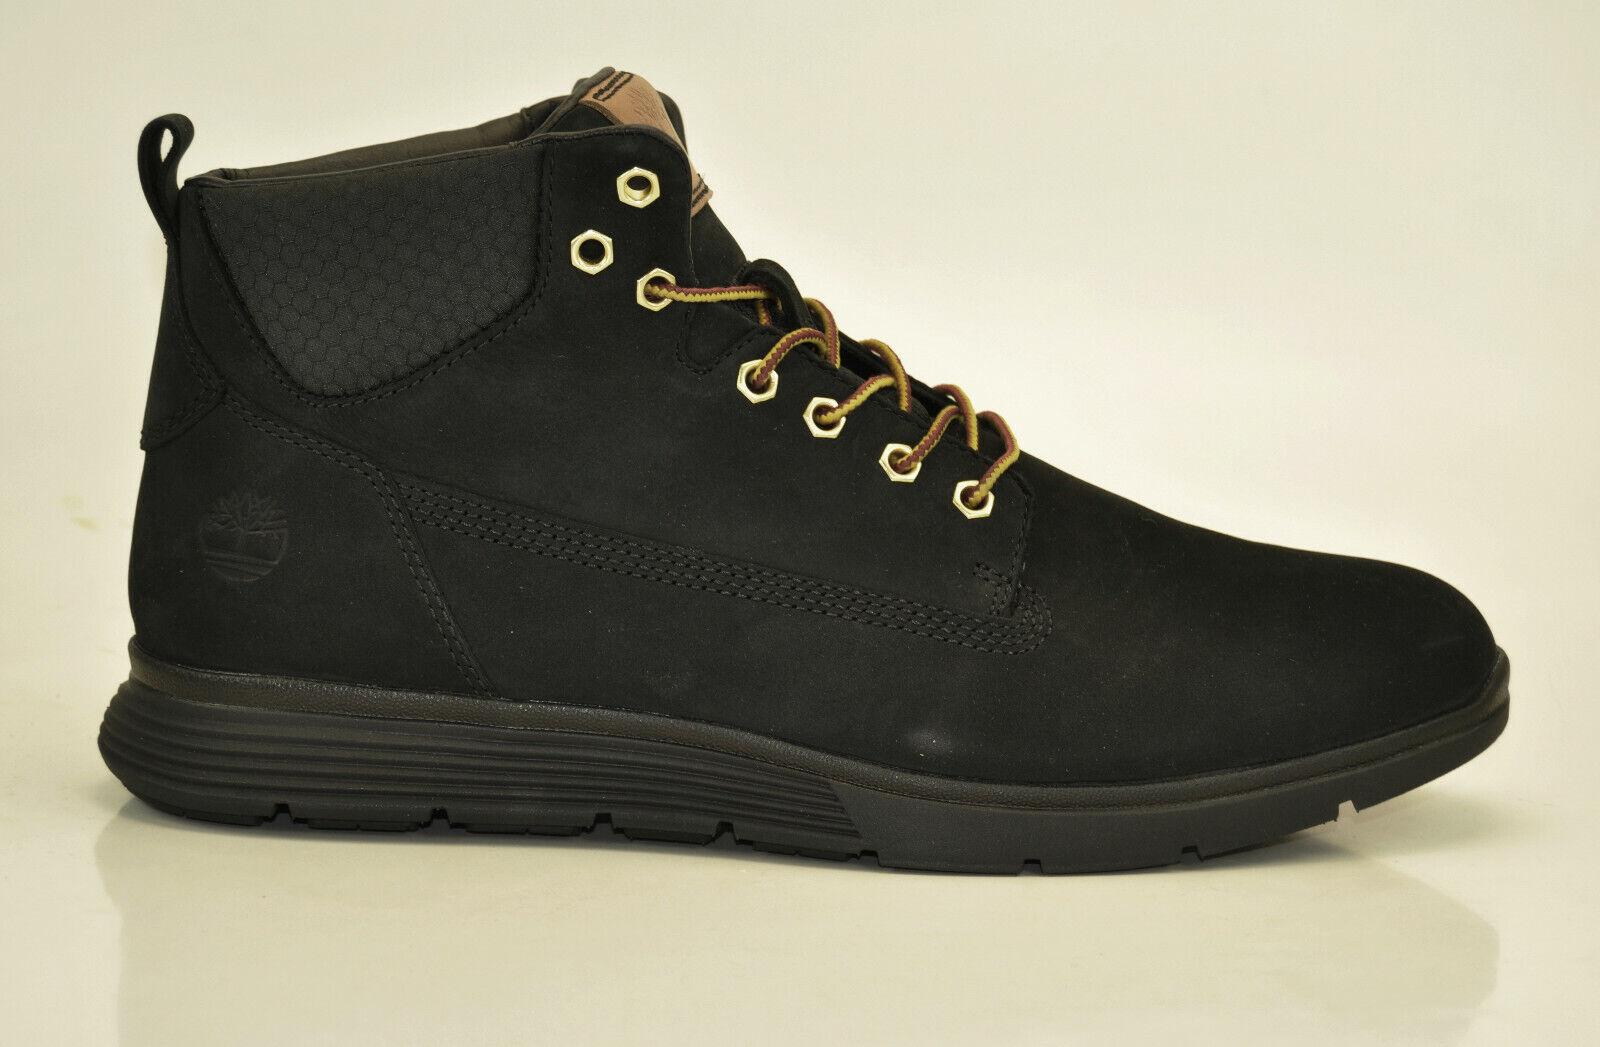 Considerar bádminton Antorchas  Timberland Killington Hiker Chukka Boots Men Lace Up Sensorflex A19UK for  sale online   eBay